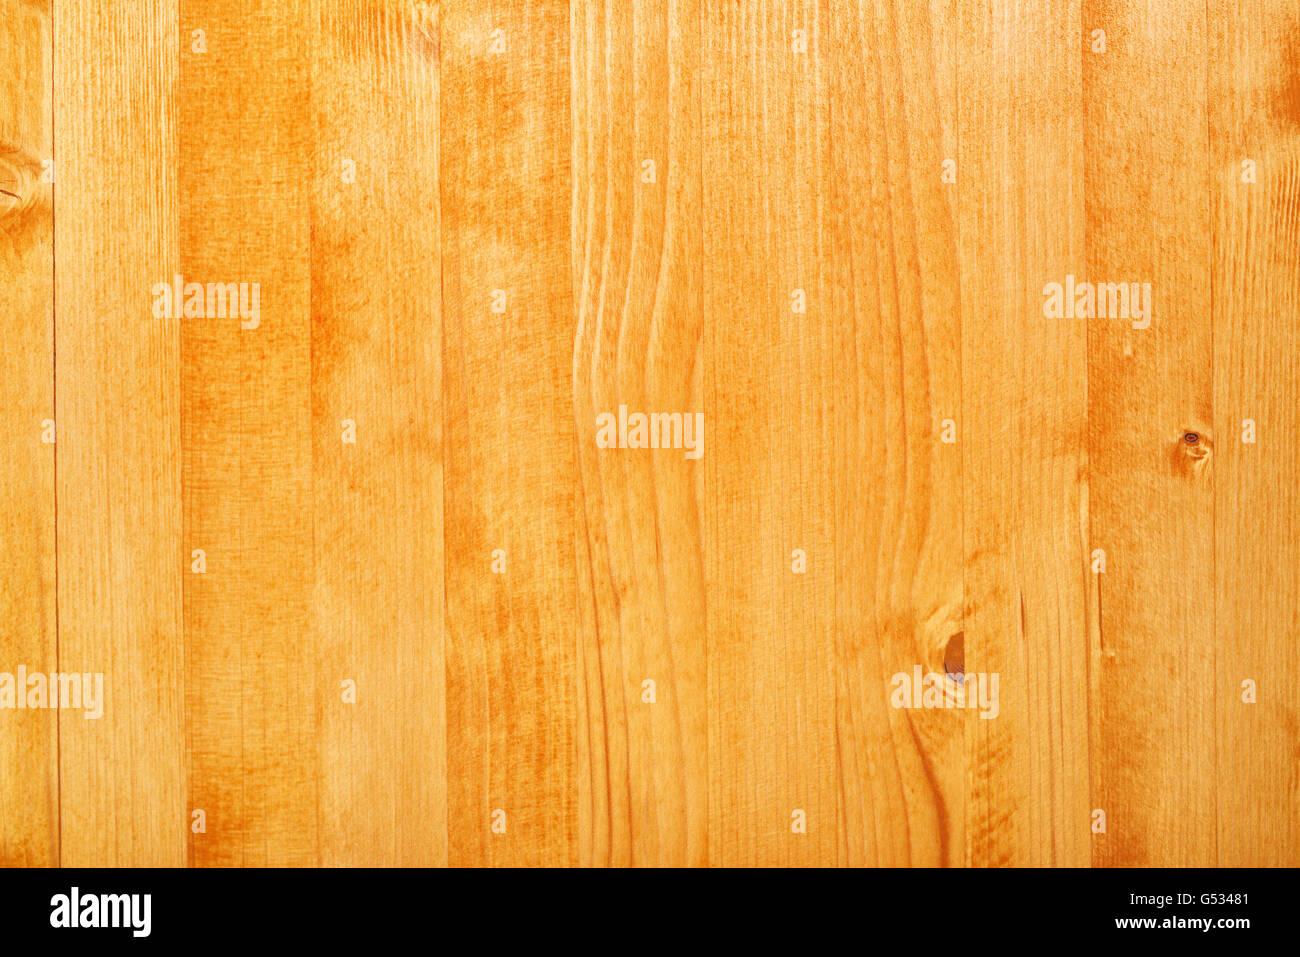 Yellow Hardwood Boards ~ Wood based stock photos images alamy